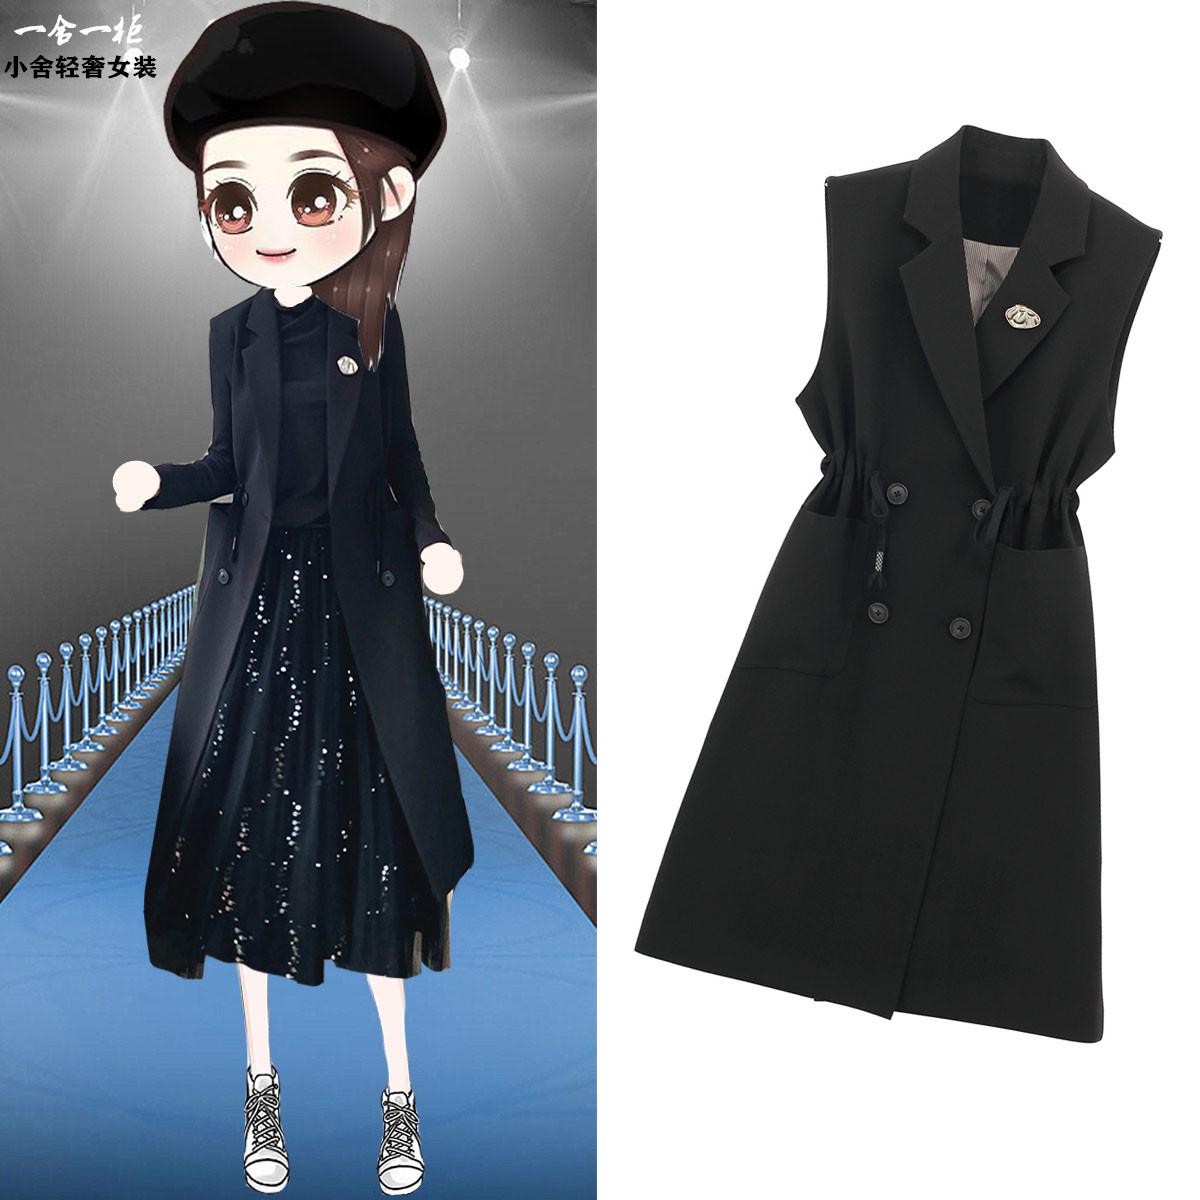 Waistcoat womens new fall 2019 Korean medium and long style suit coat with waistband and thin waistcoat